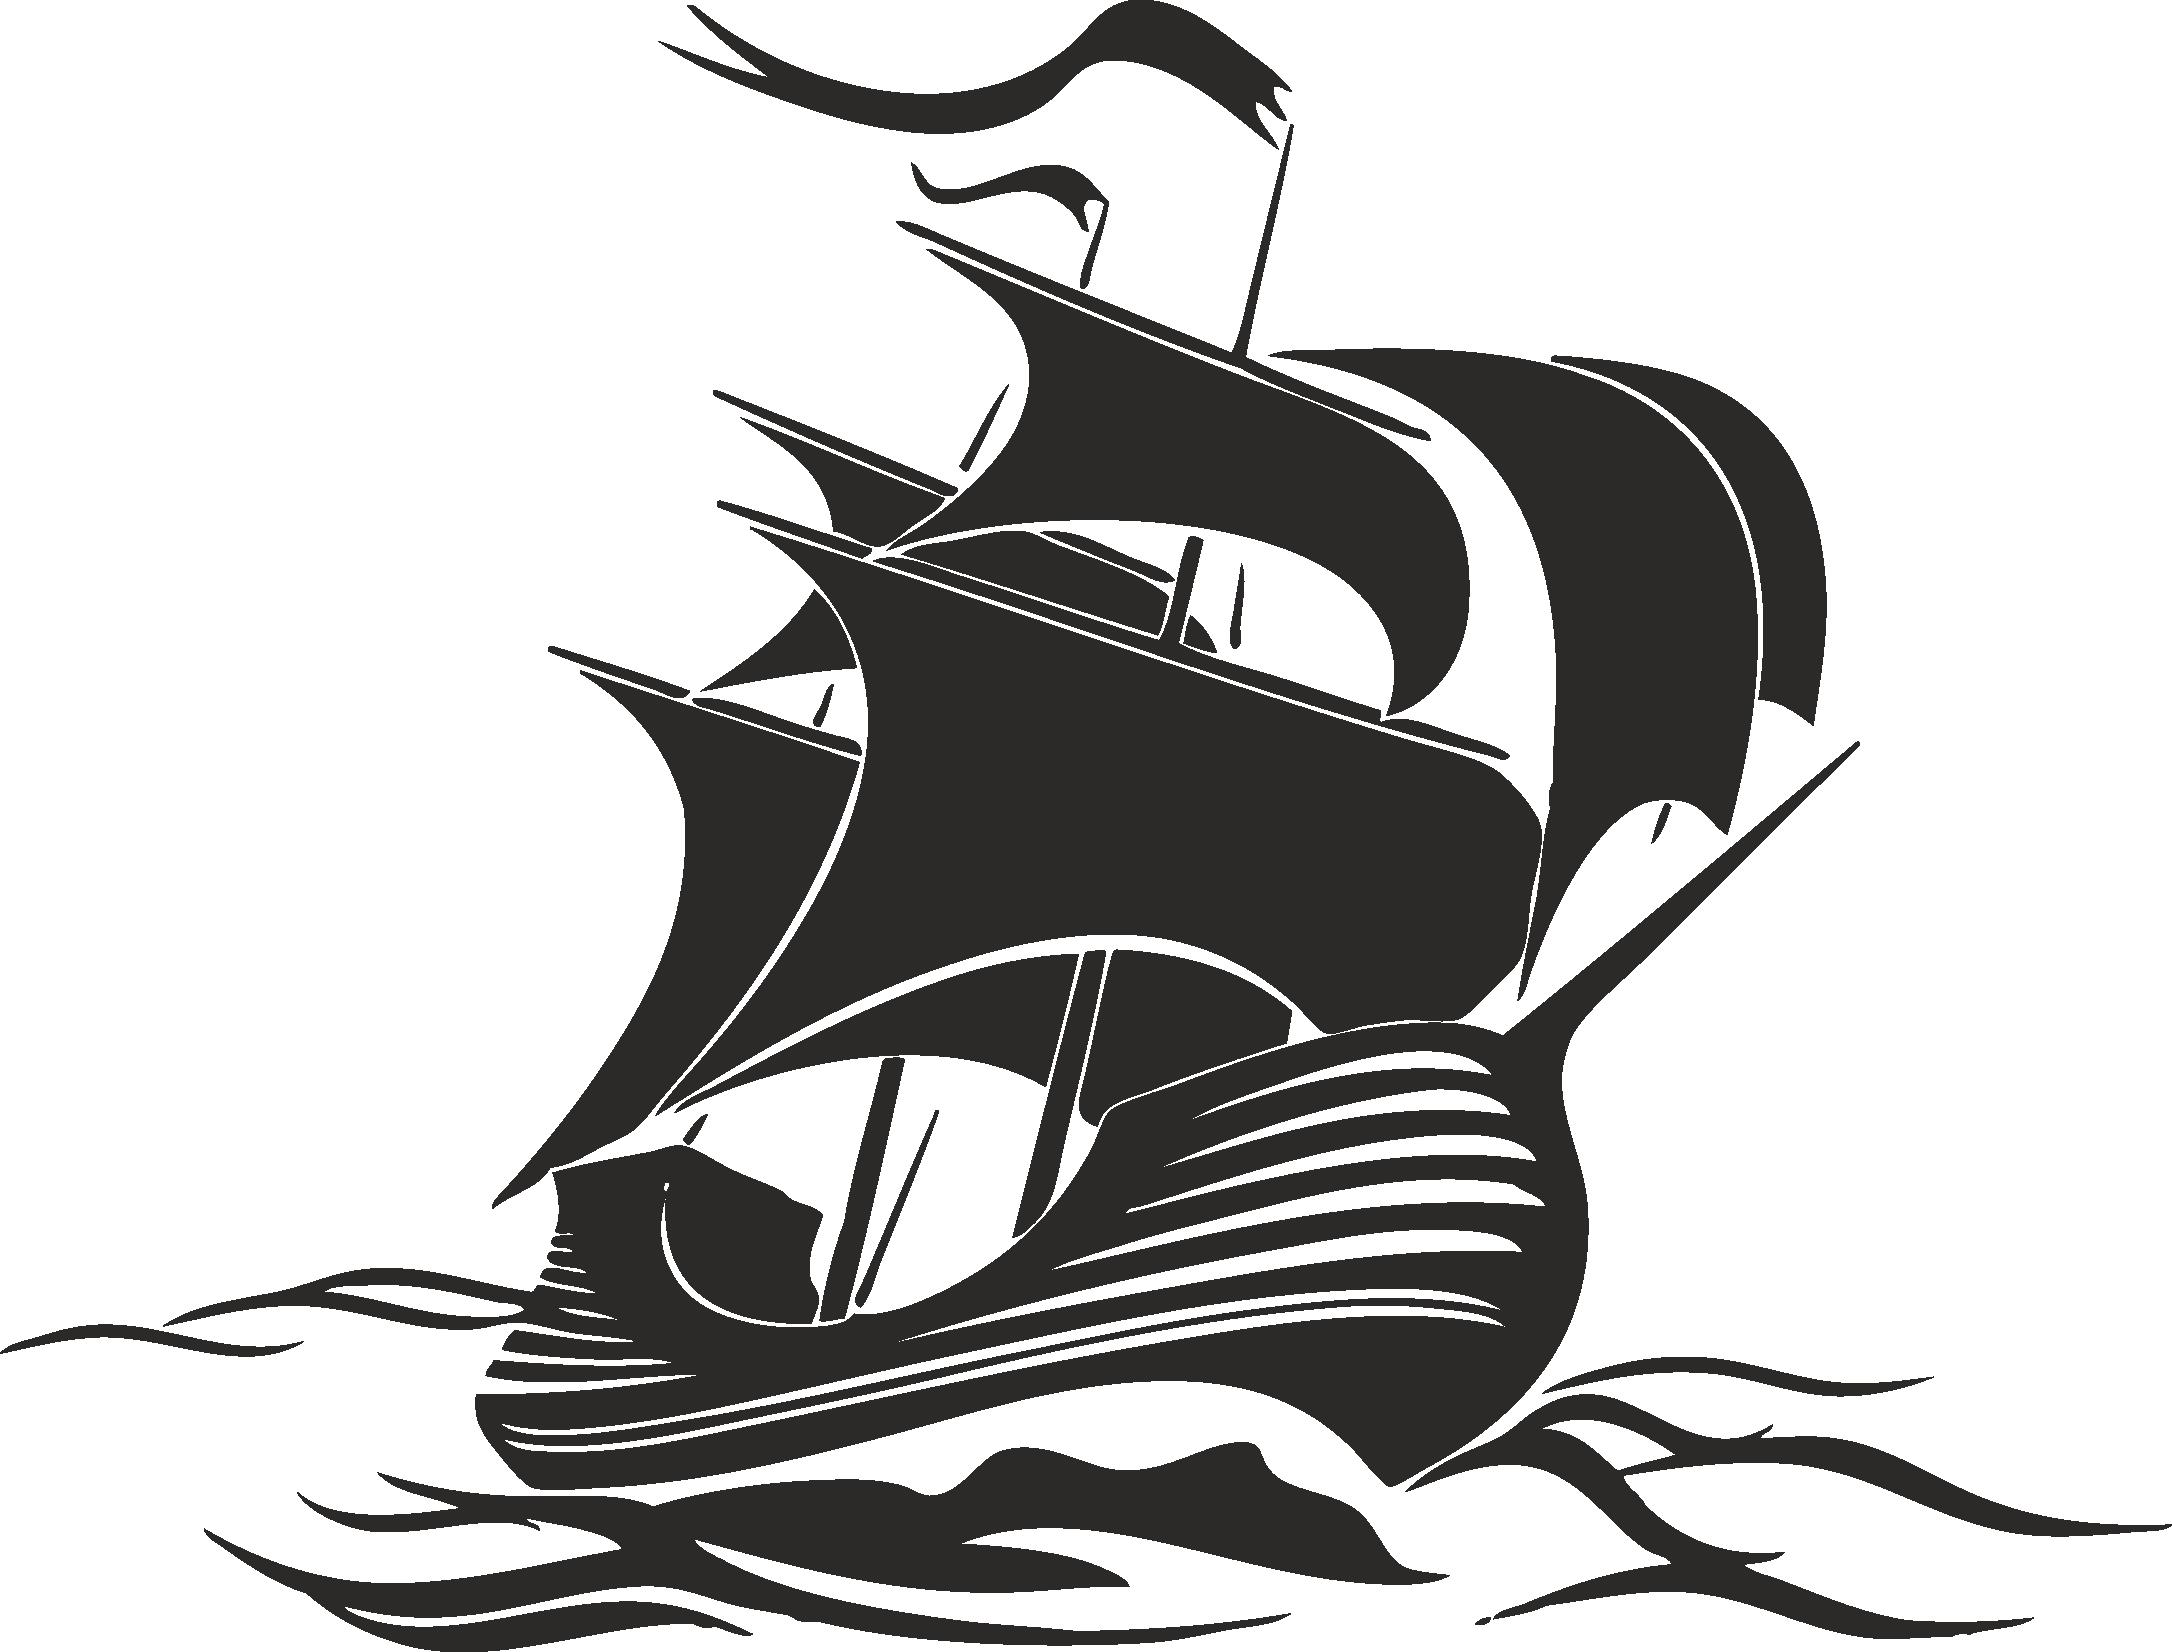 Sailboat Beautiful Silhouettes Of Sailing Ships 02 Free DXF File